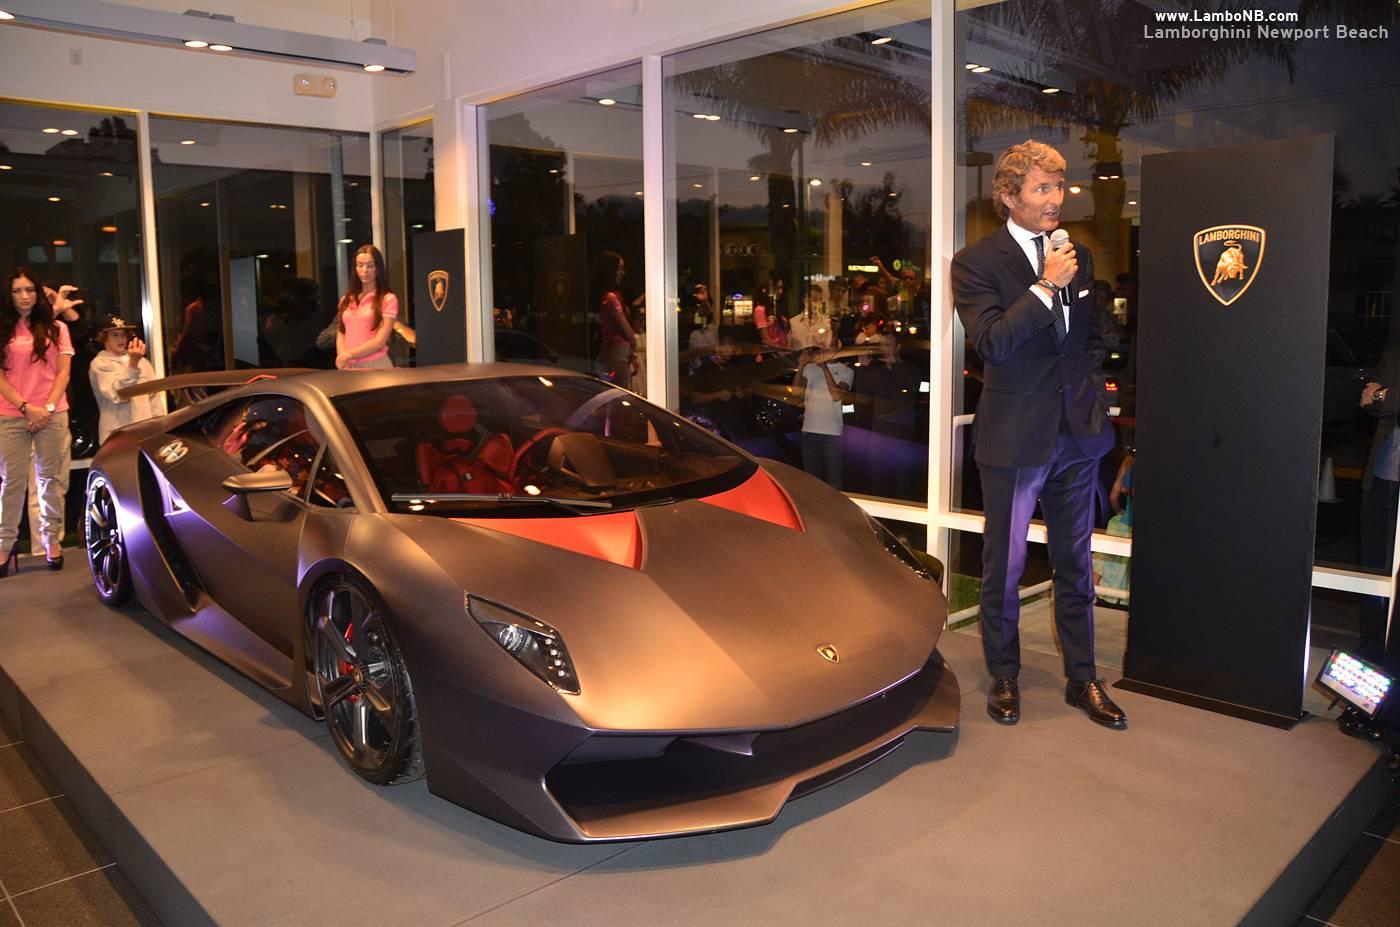 Lamborghini President and CEO Stephan Winkelmann presenting the Sesto Elemento